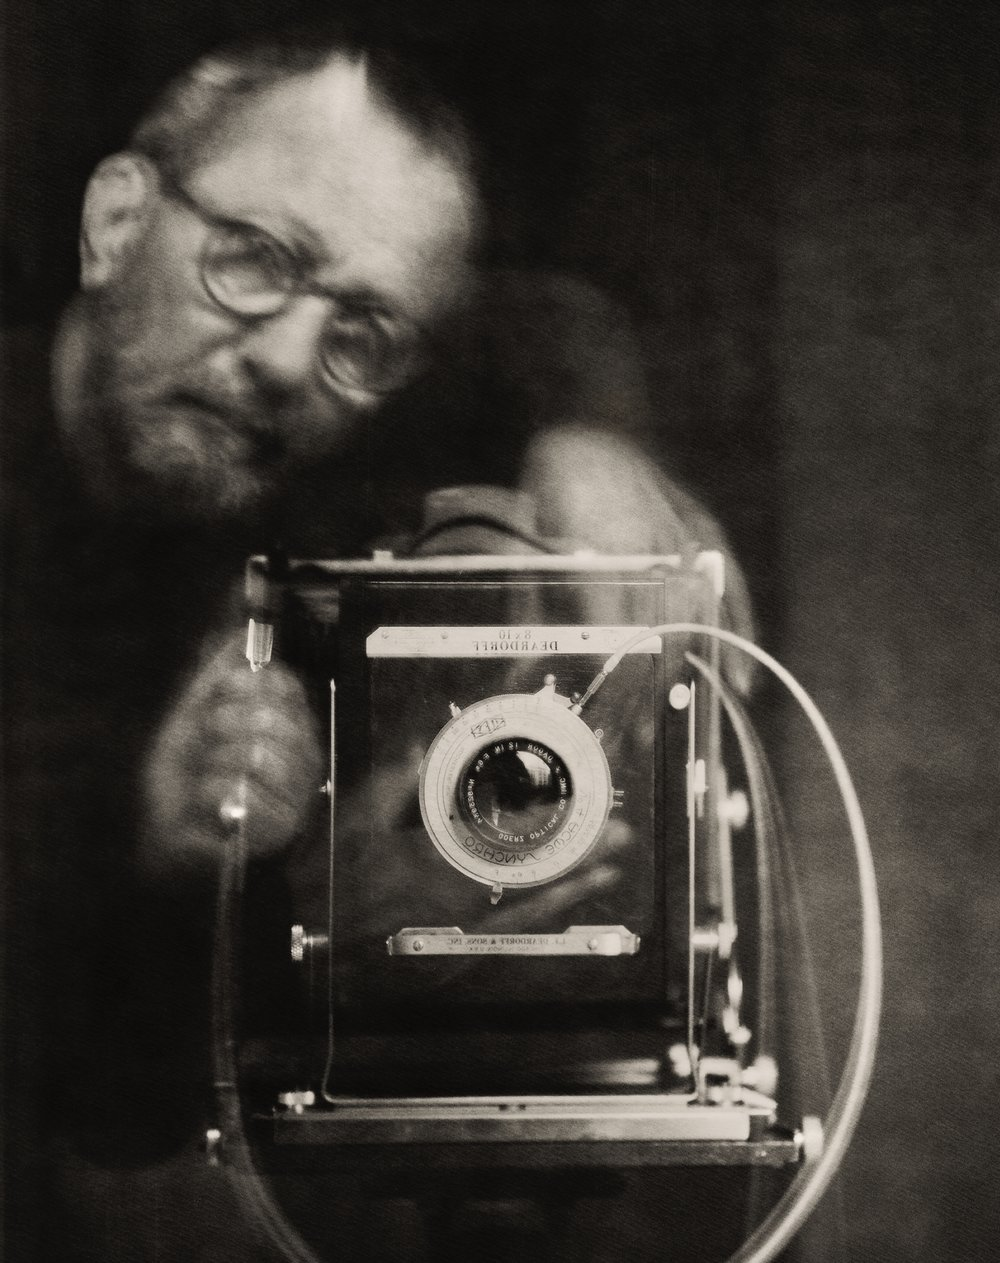 PAOLO ROVERSI  Photo: Self portrait, Paolo Roversi ©